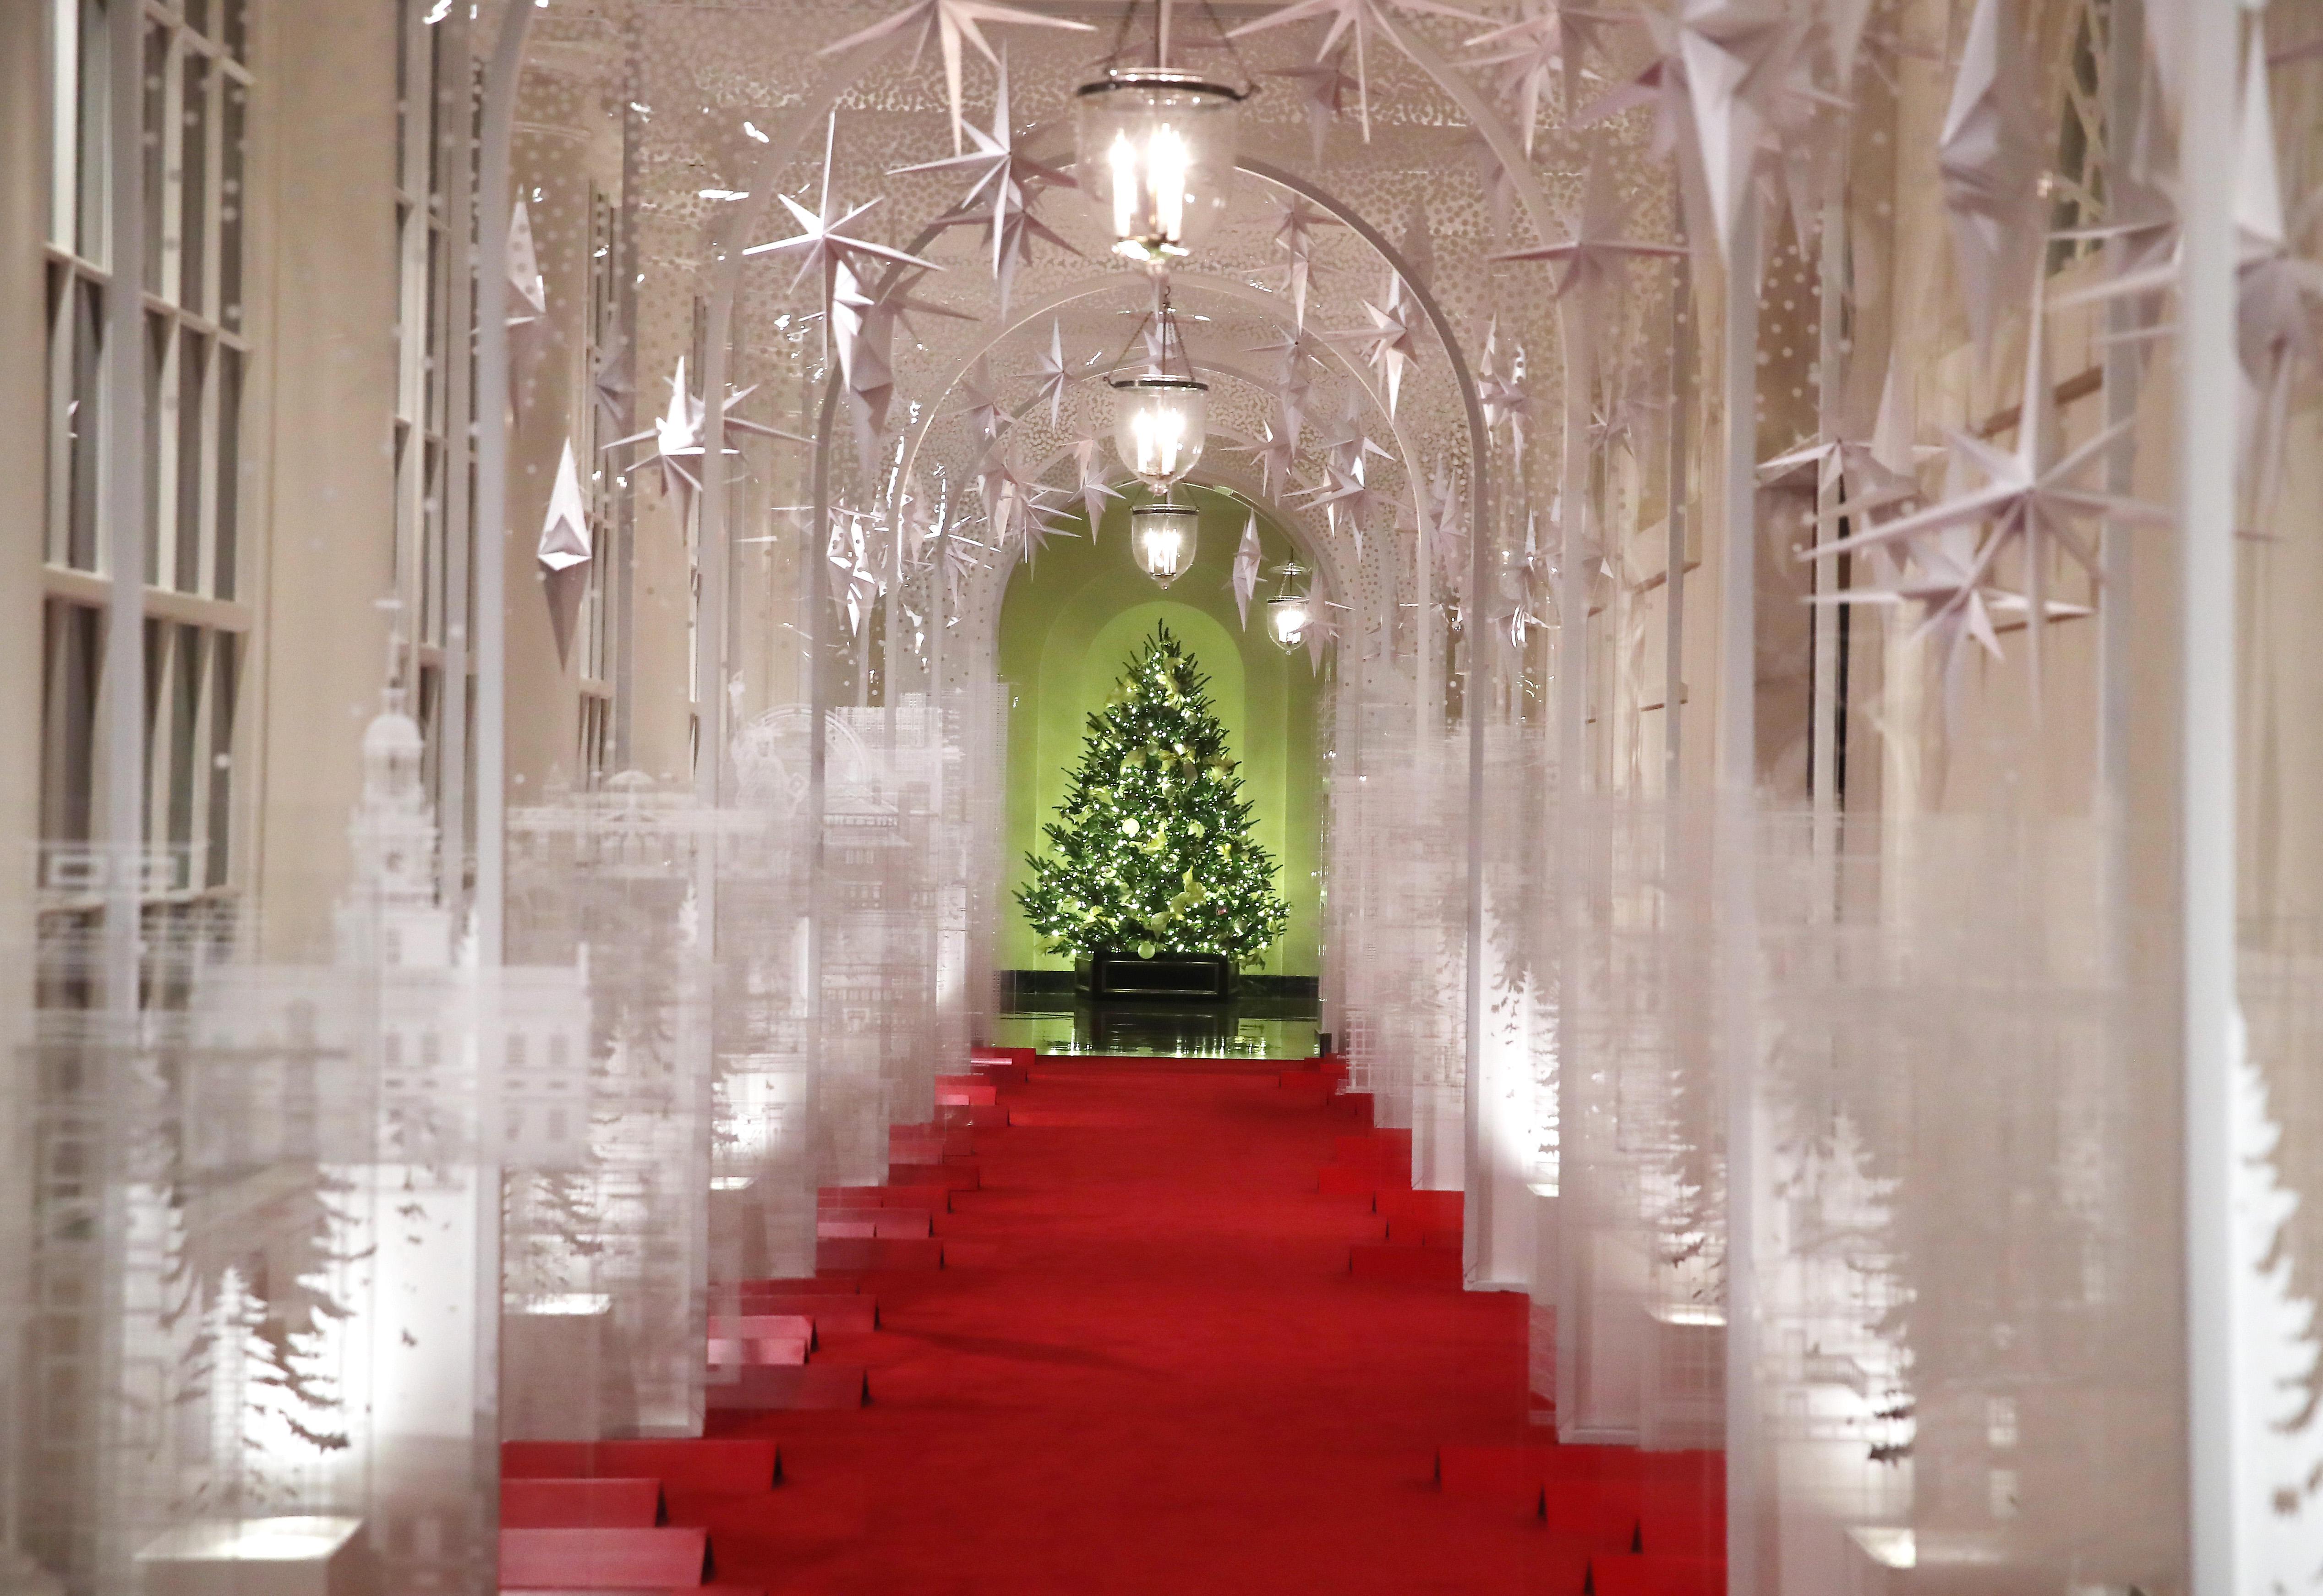 White House Christmas Decorations 2019 Photos Cbs News